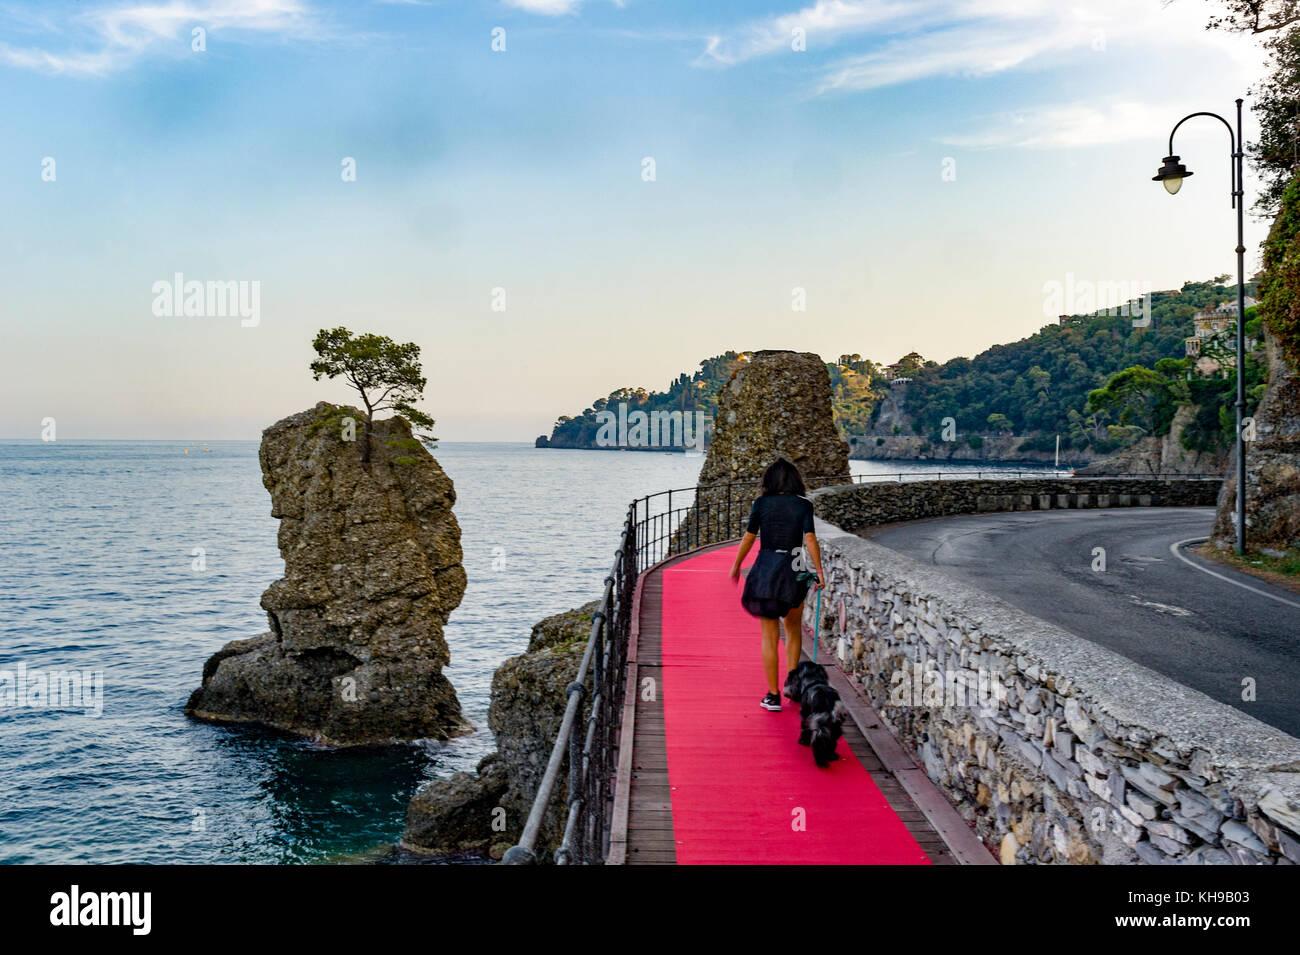 Italy. Liguria. Gulf of Tigullio, Italian Riviera. The red carpet linking Rapallo to Portofino and the Cadrega's - Stock Image